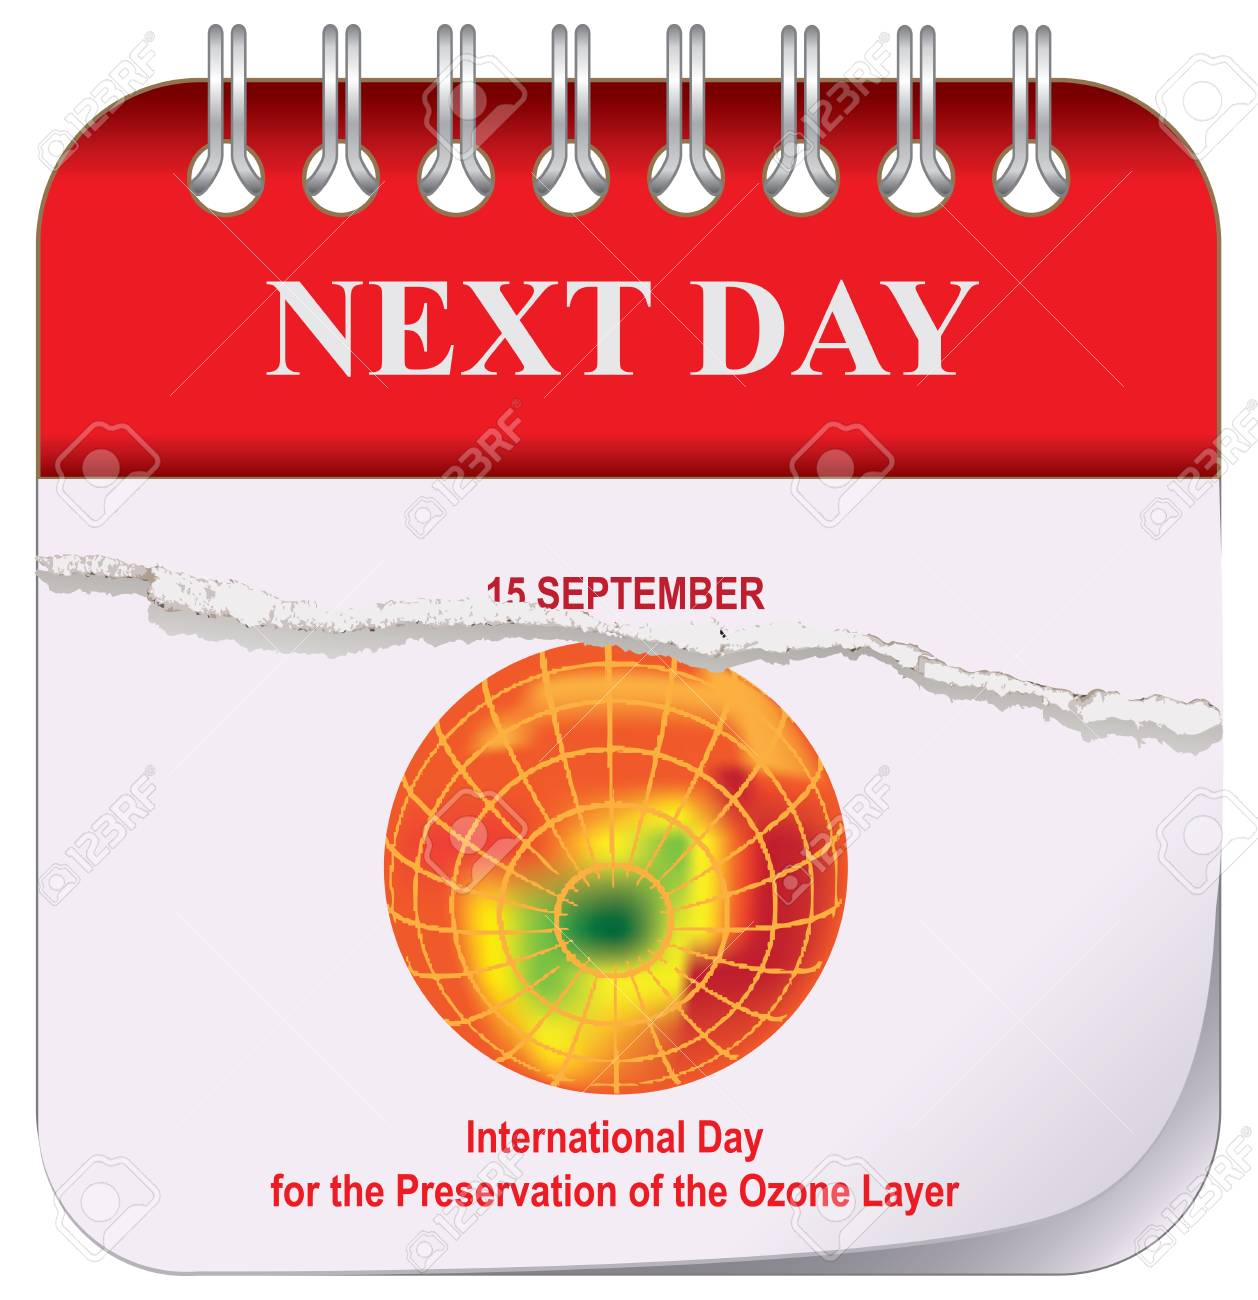 Calendar - Next Day  After September 15, International Day for